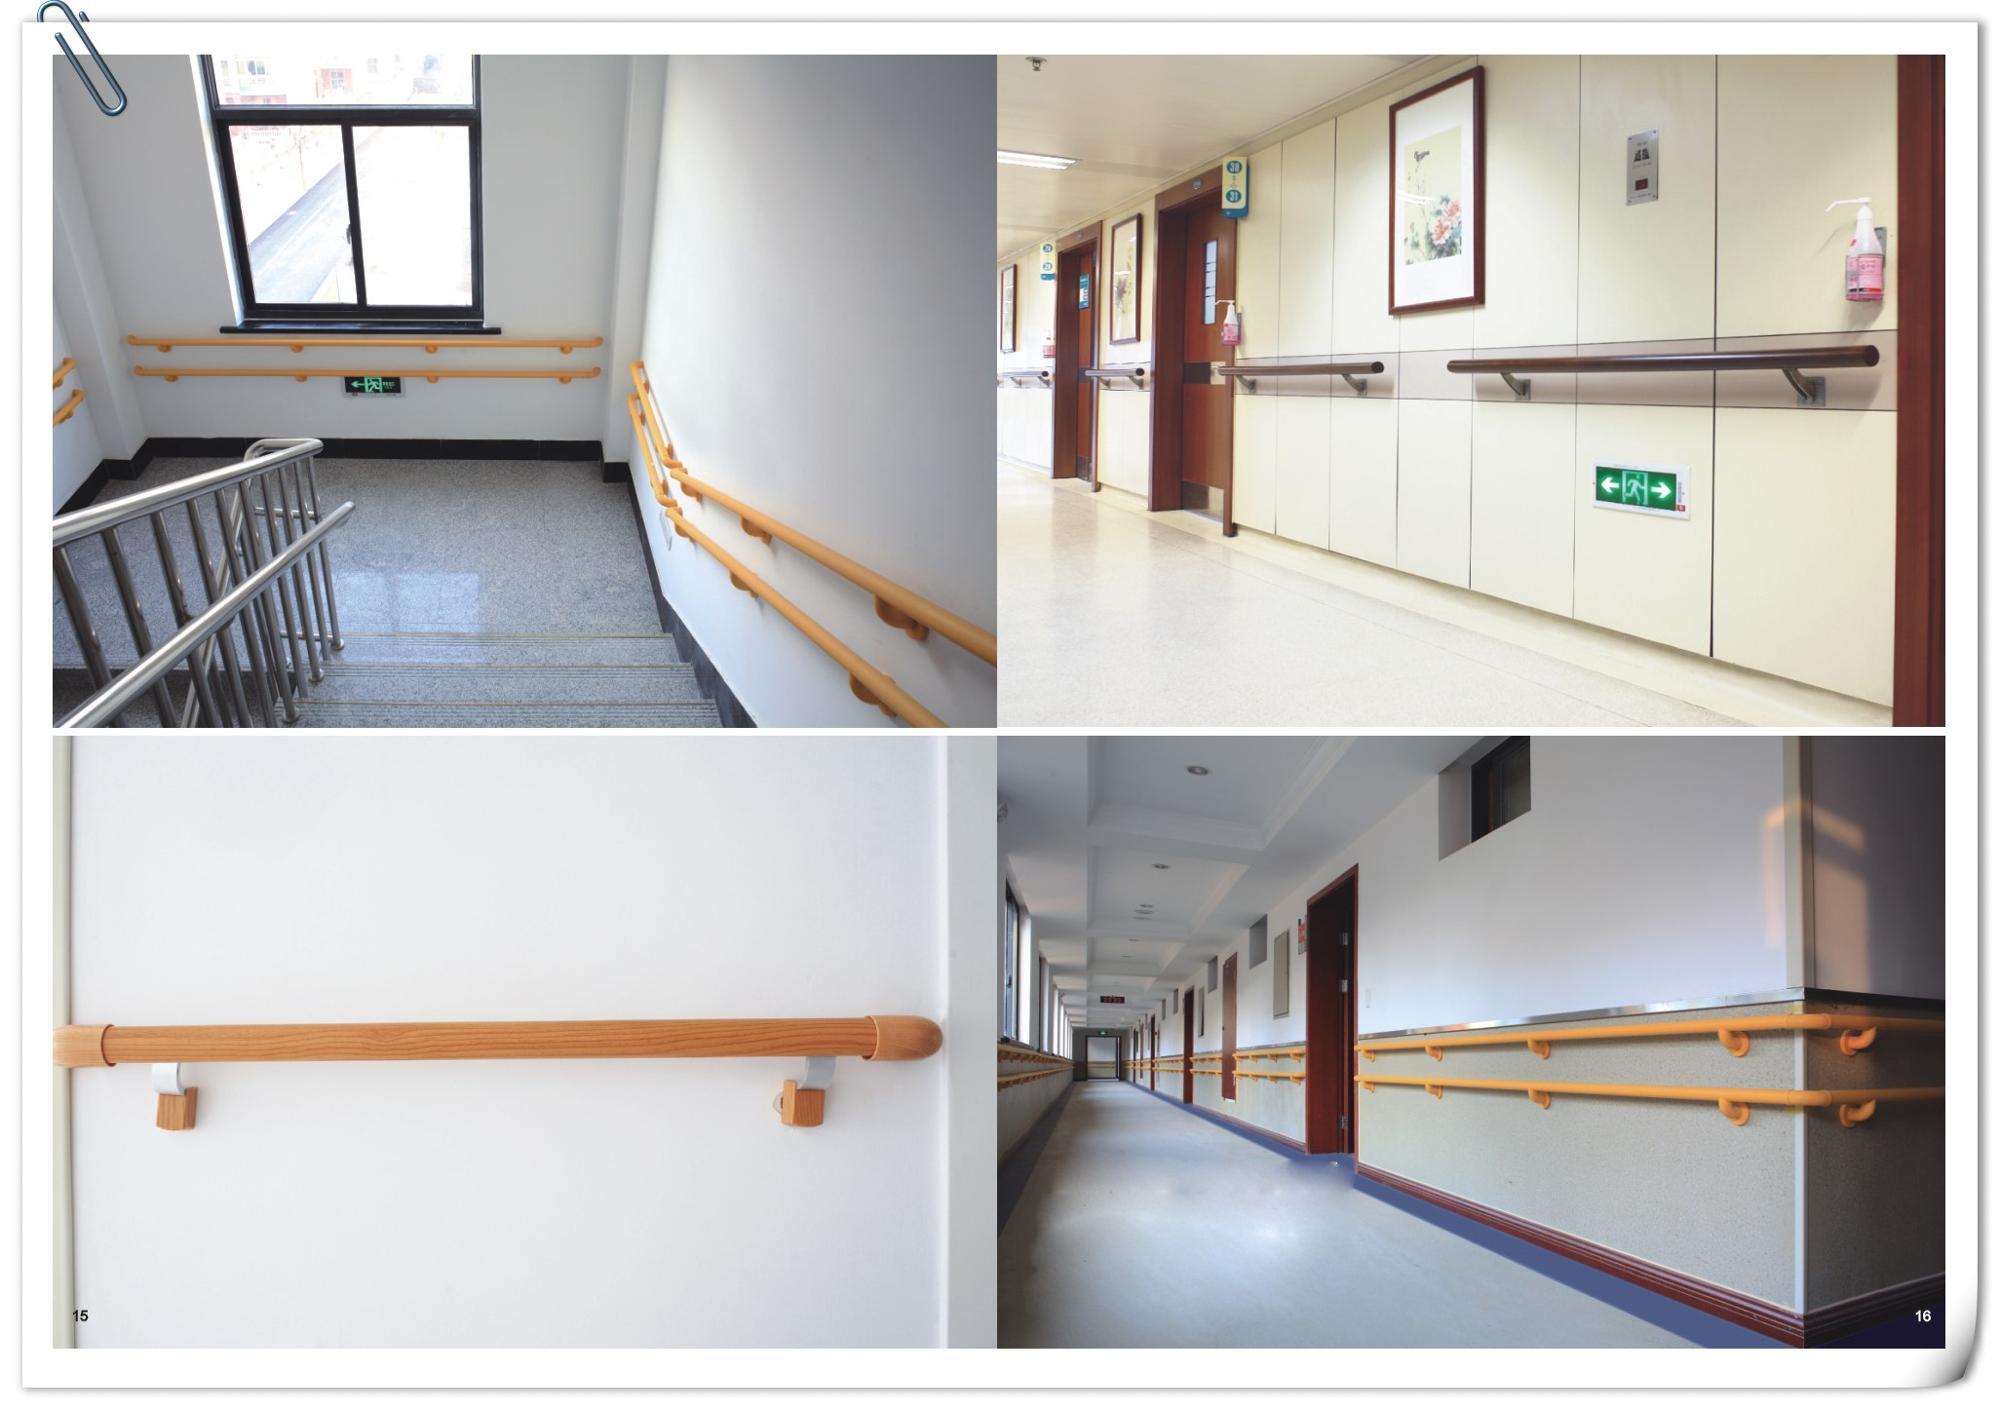 Pvc Hospital Hallway Handrail Aluminum Anti Collision